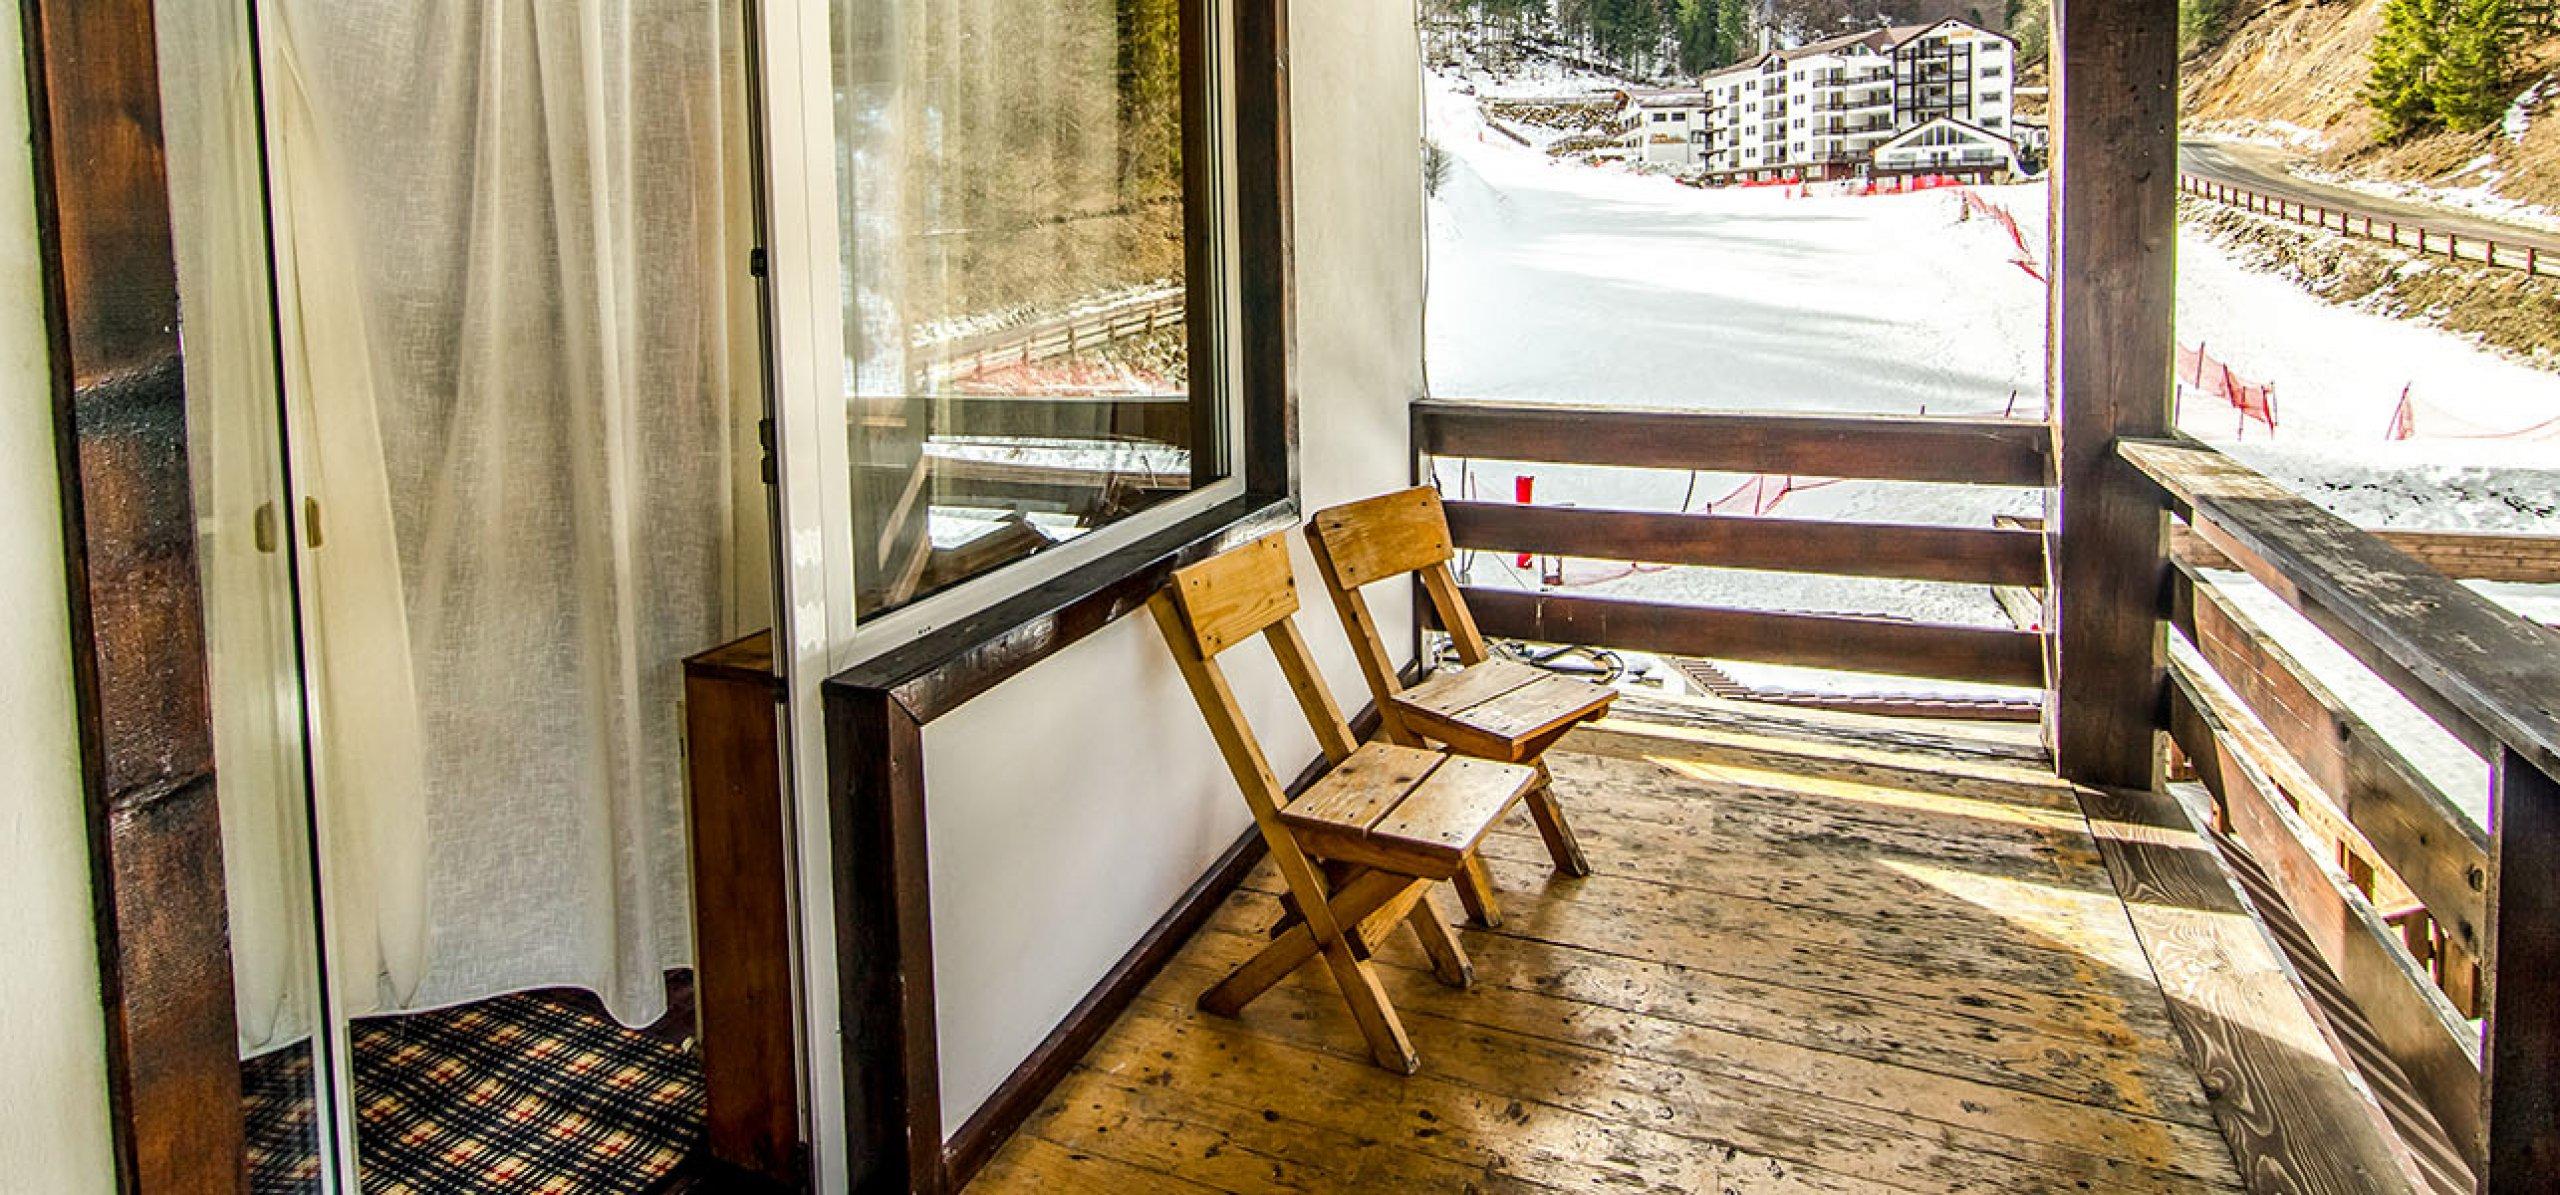 balcon-hotel-cheia-hoteluri-moeciu